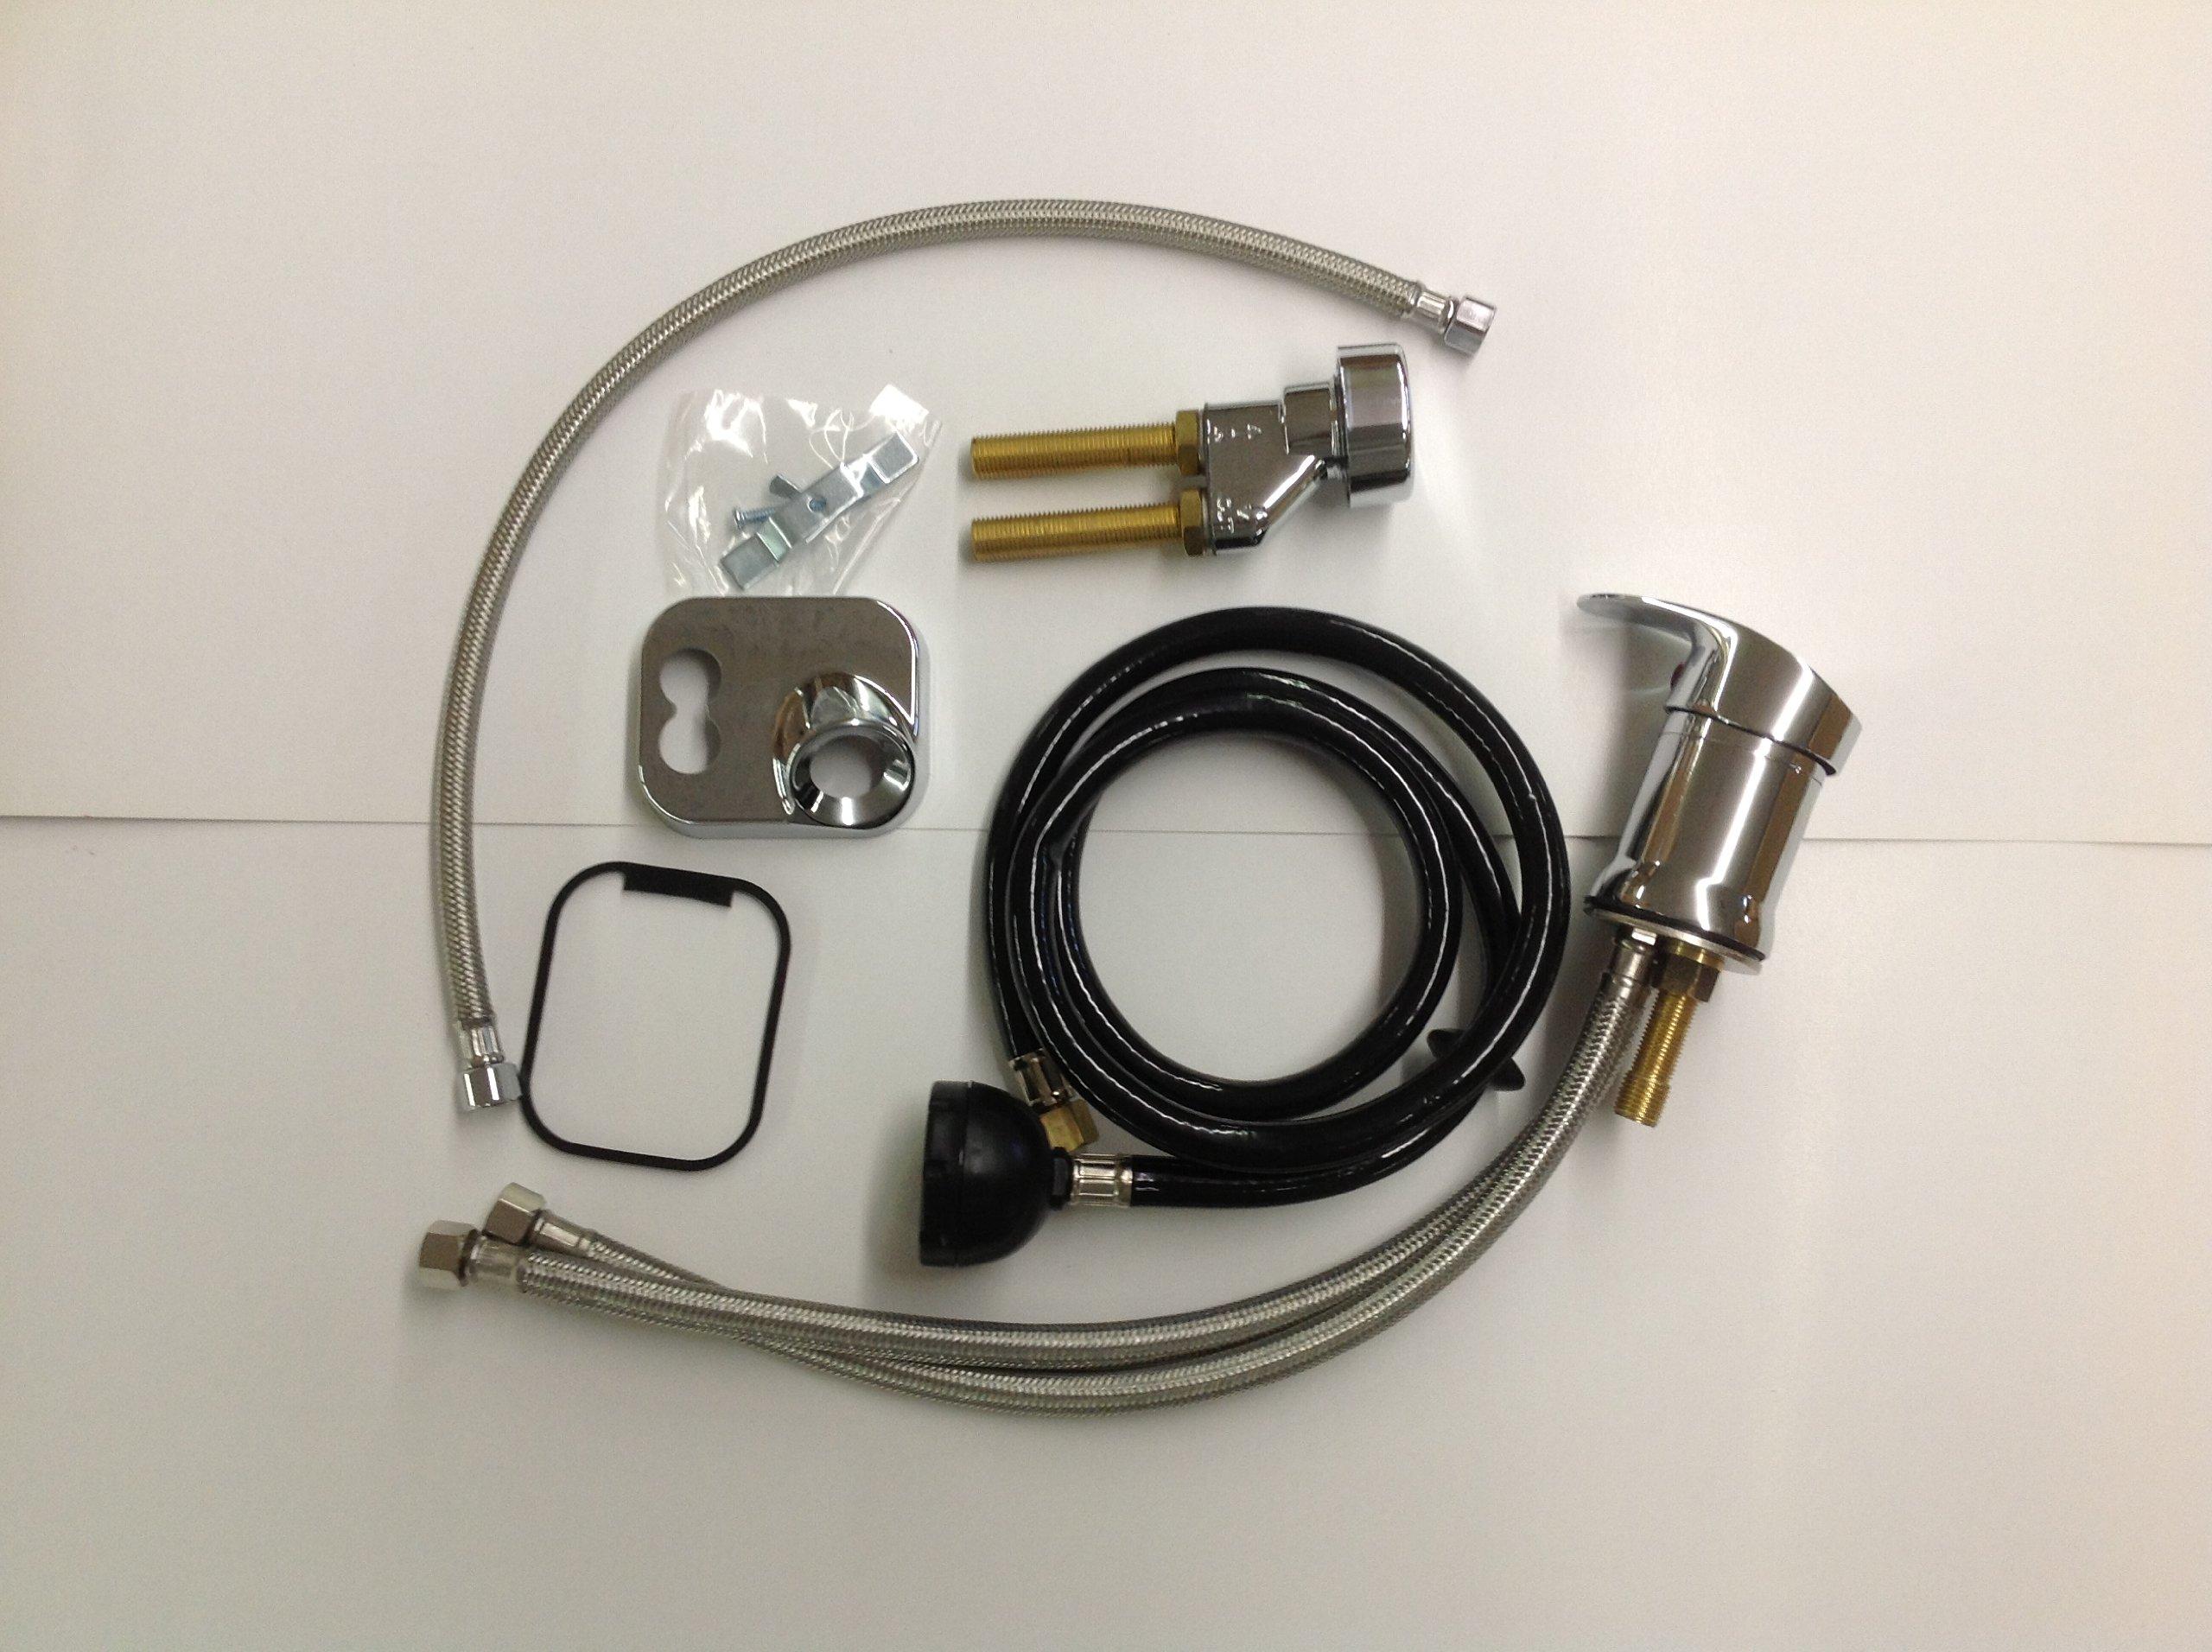 AR 550 Salon Shampoo Bowl Faucet, Sprayer & Vacuum Breaker Kit Fits Belvedere